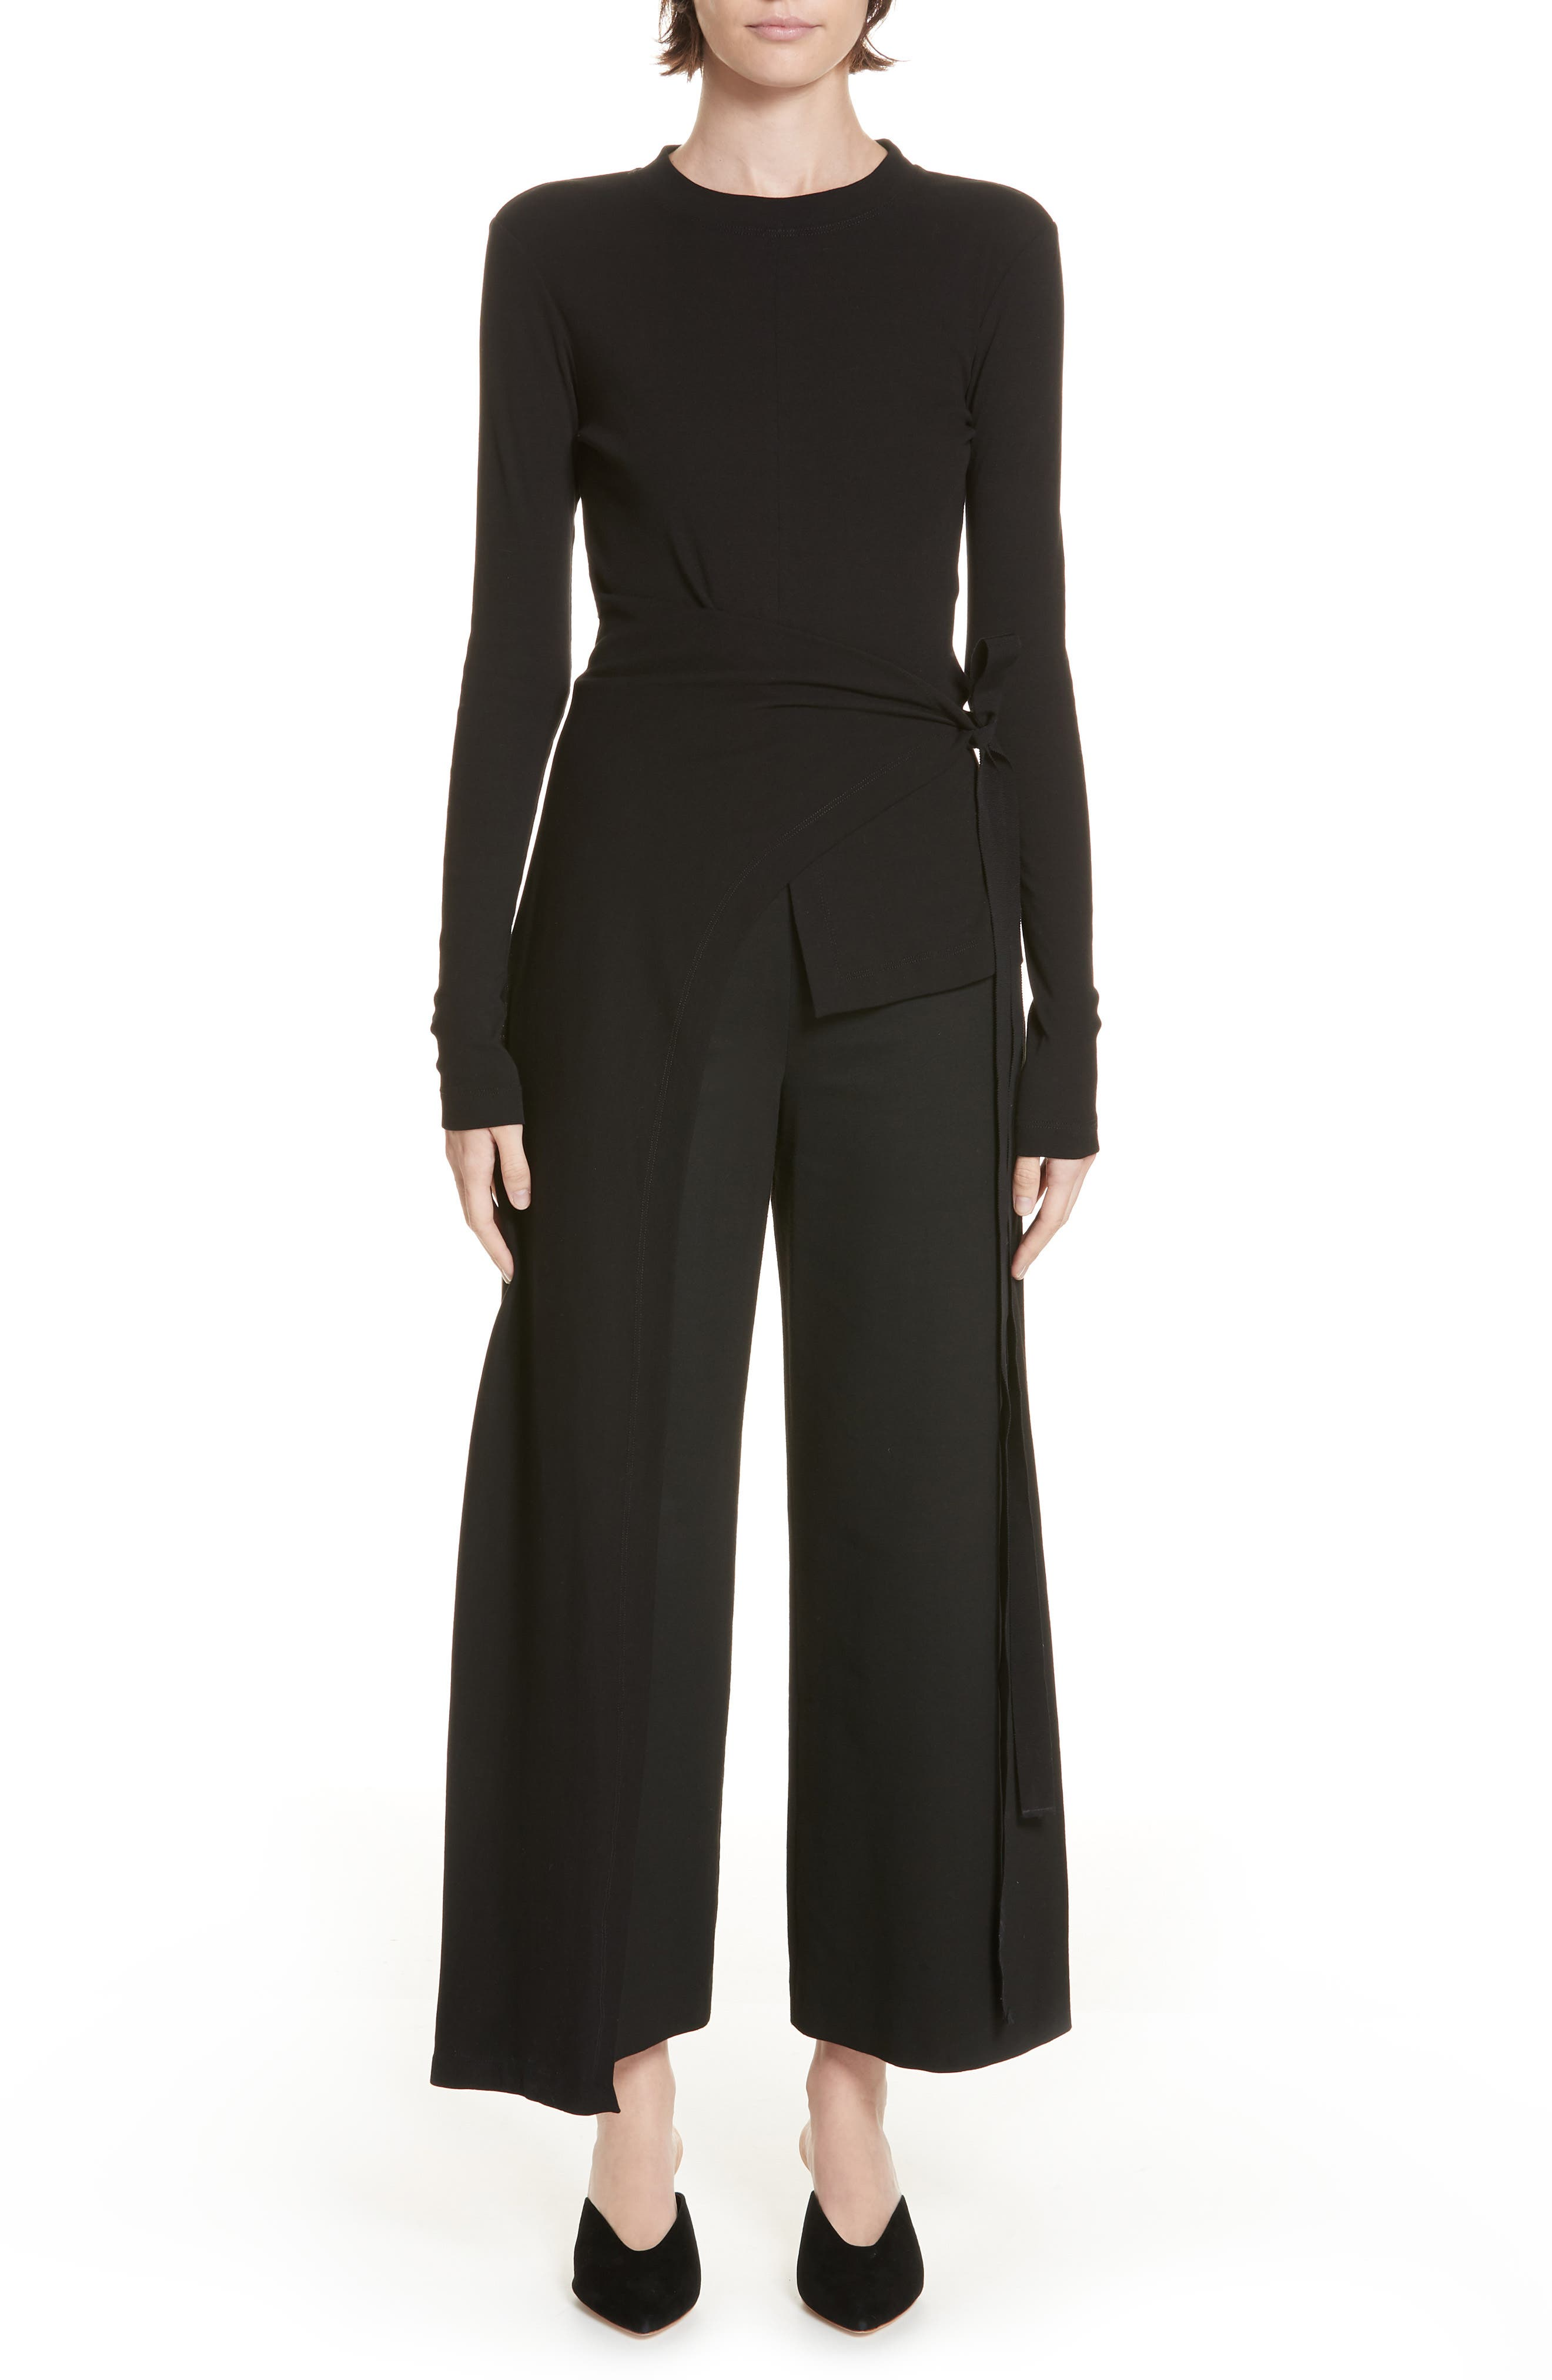 ROSETTA GETTY Crewneck Long-Sleeve Split-Apron Jersey Top in Black